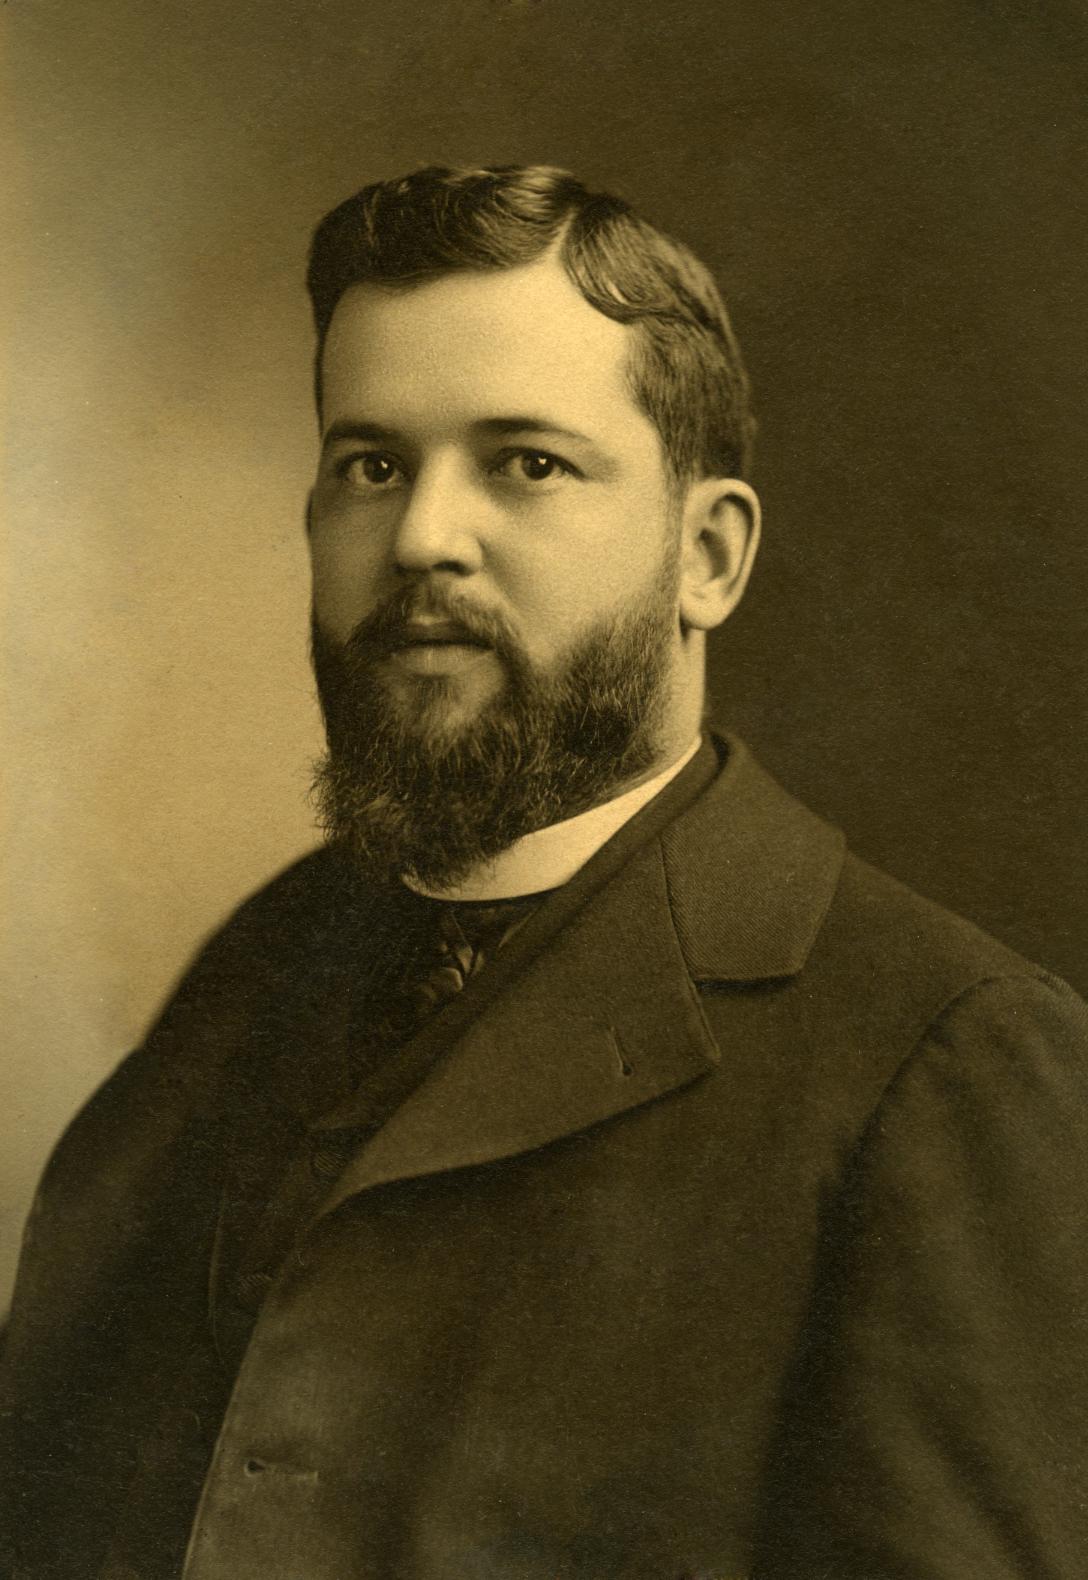 Fr. Richard Kraus, O.S.B.